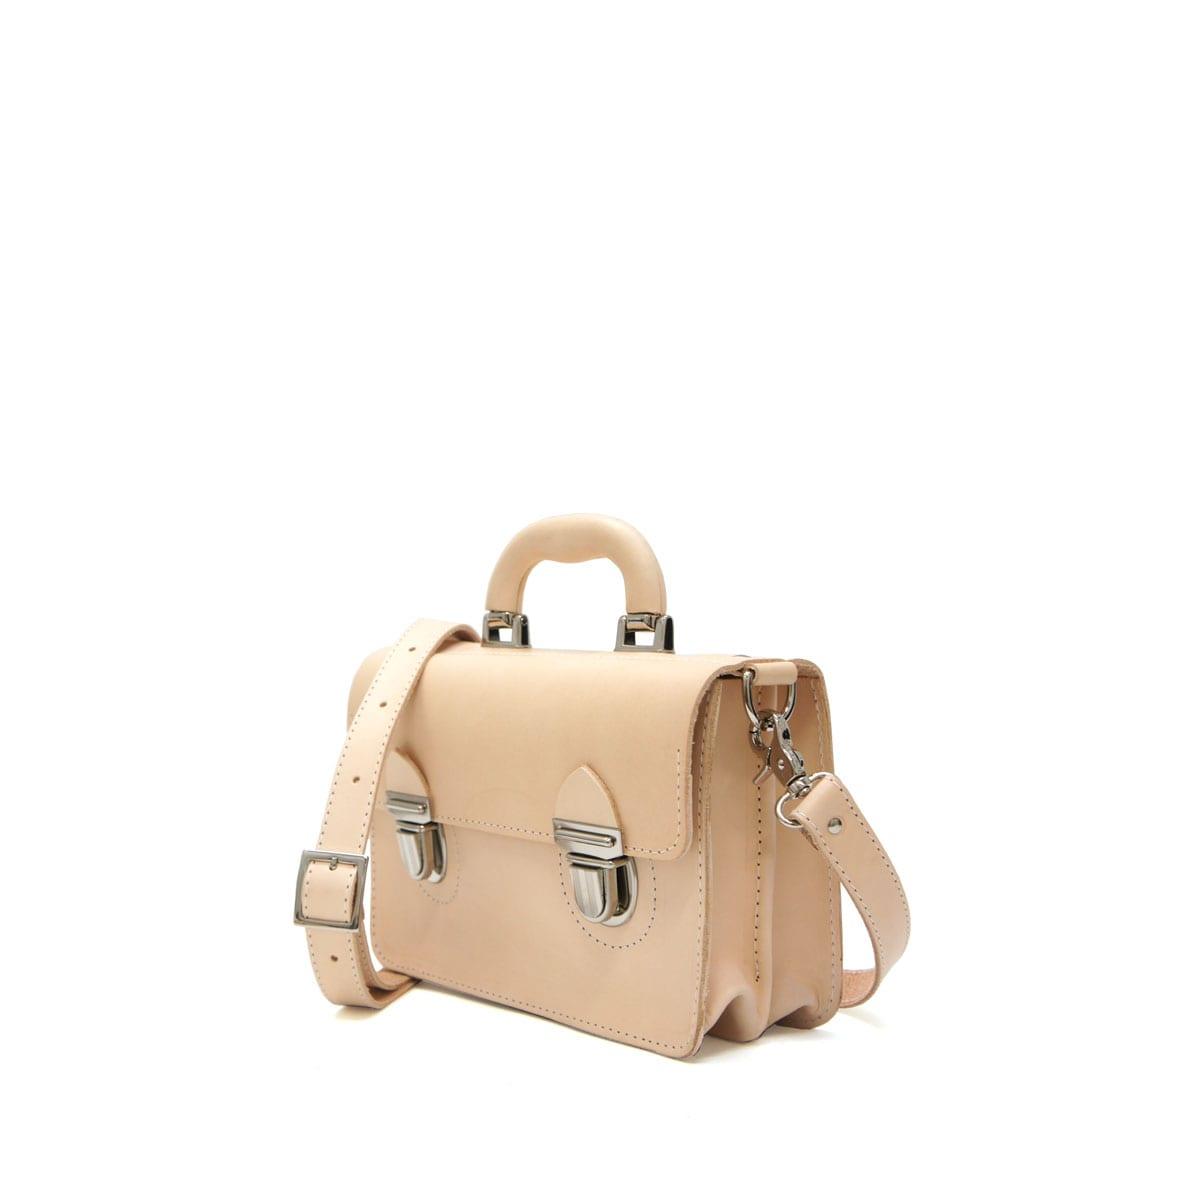 Miki Small Postman Bag Natural Lumi Accessories